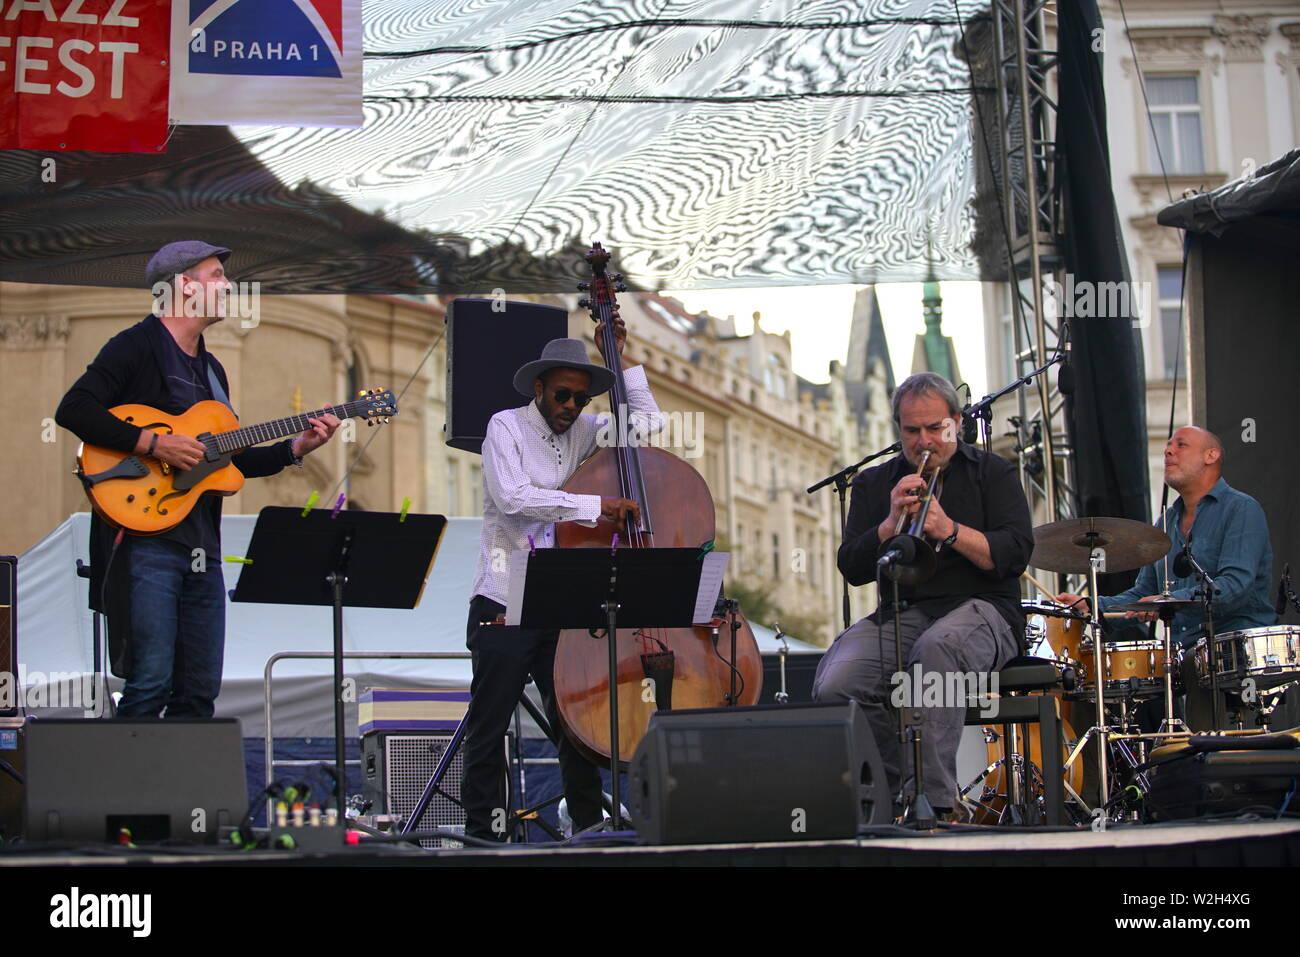 Prague, Czech Republic  8th July, 2019  Musicians perform during